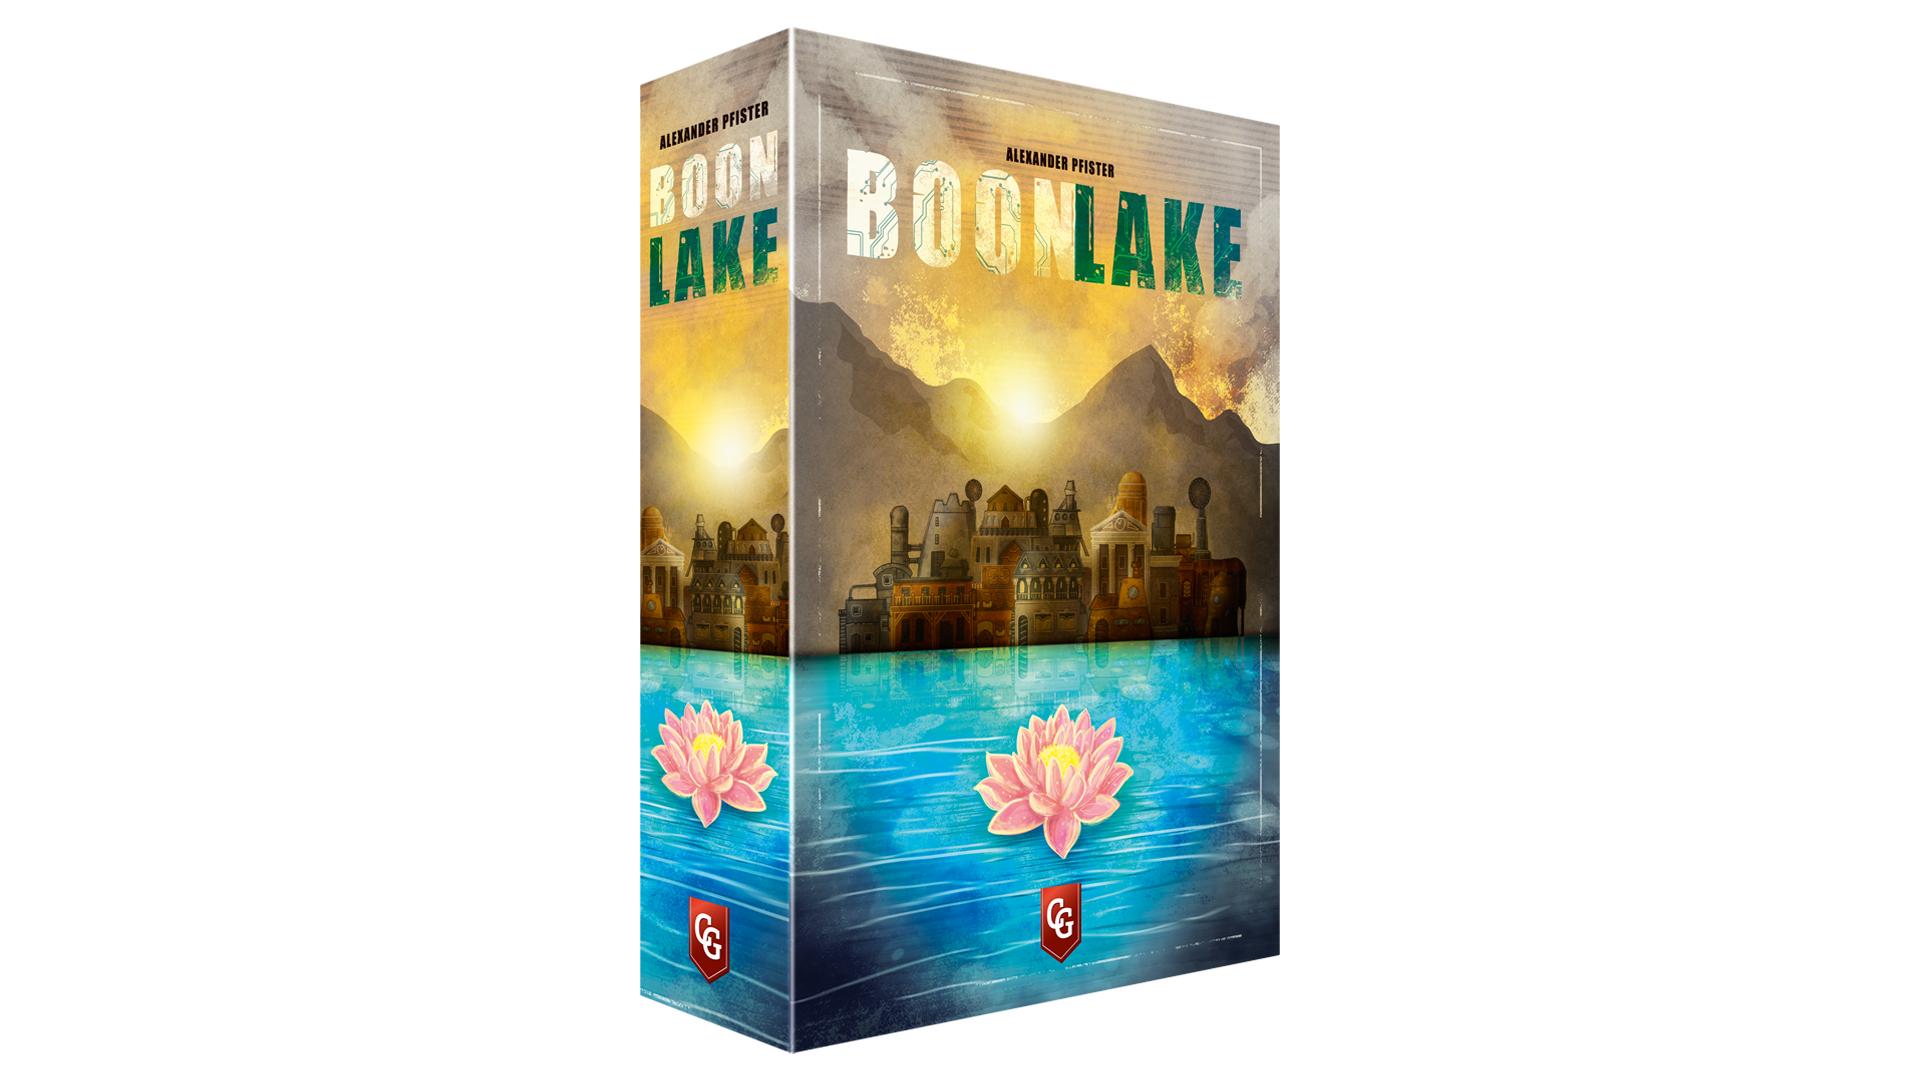 Boonlake box image